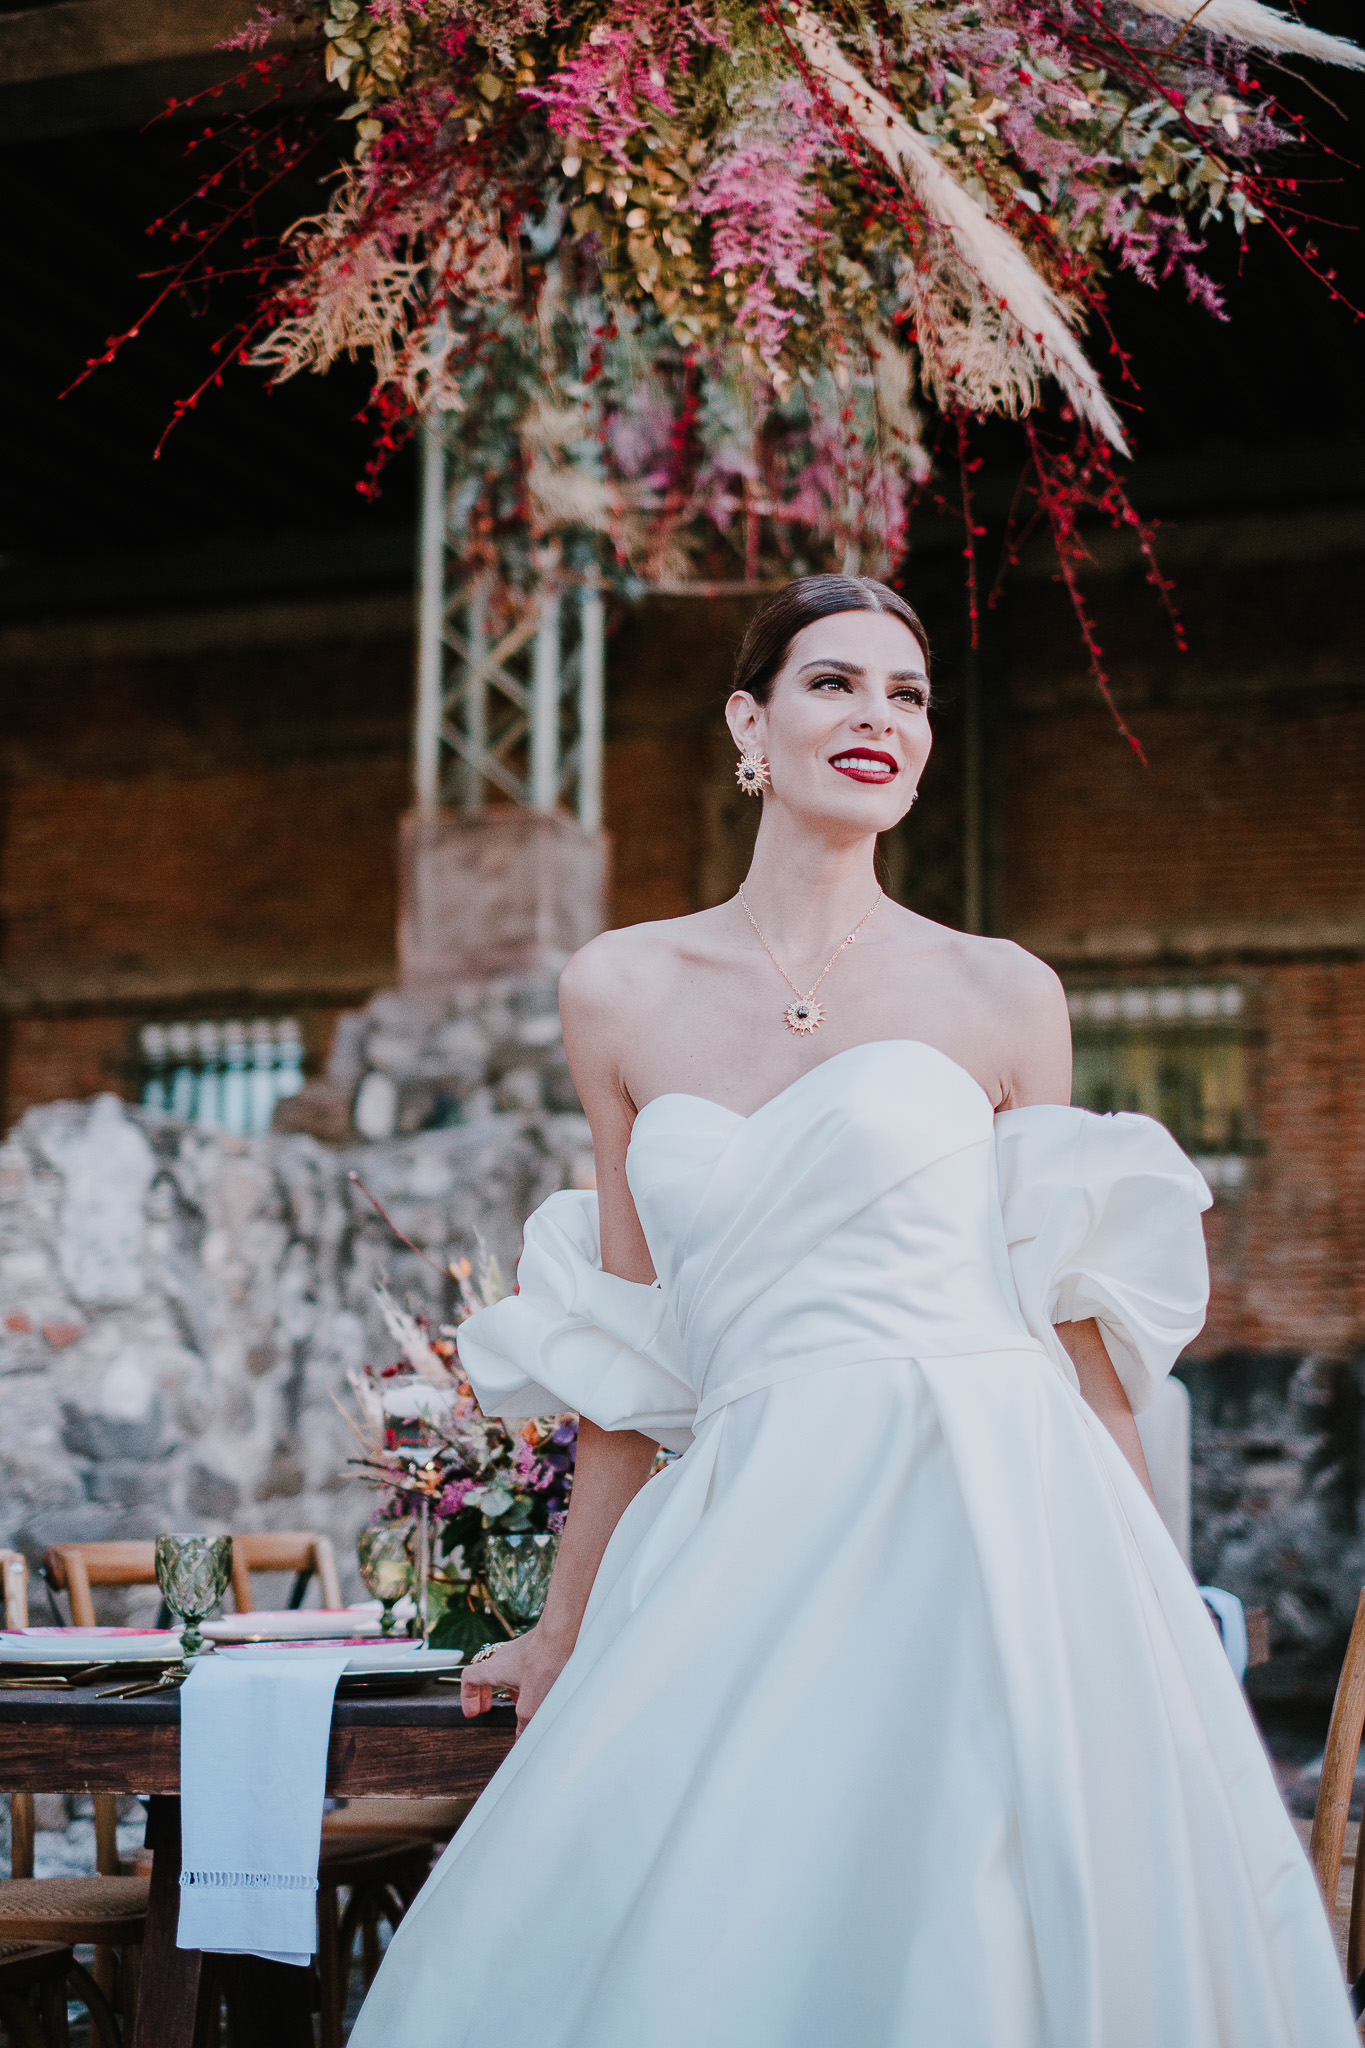 Memo Marquez Wedding Photographer